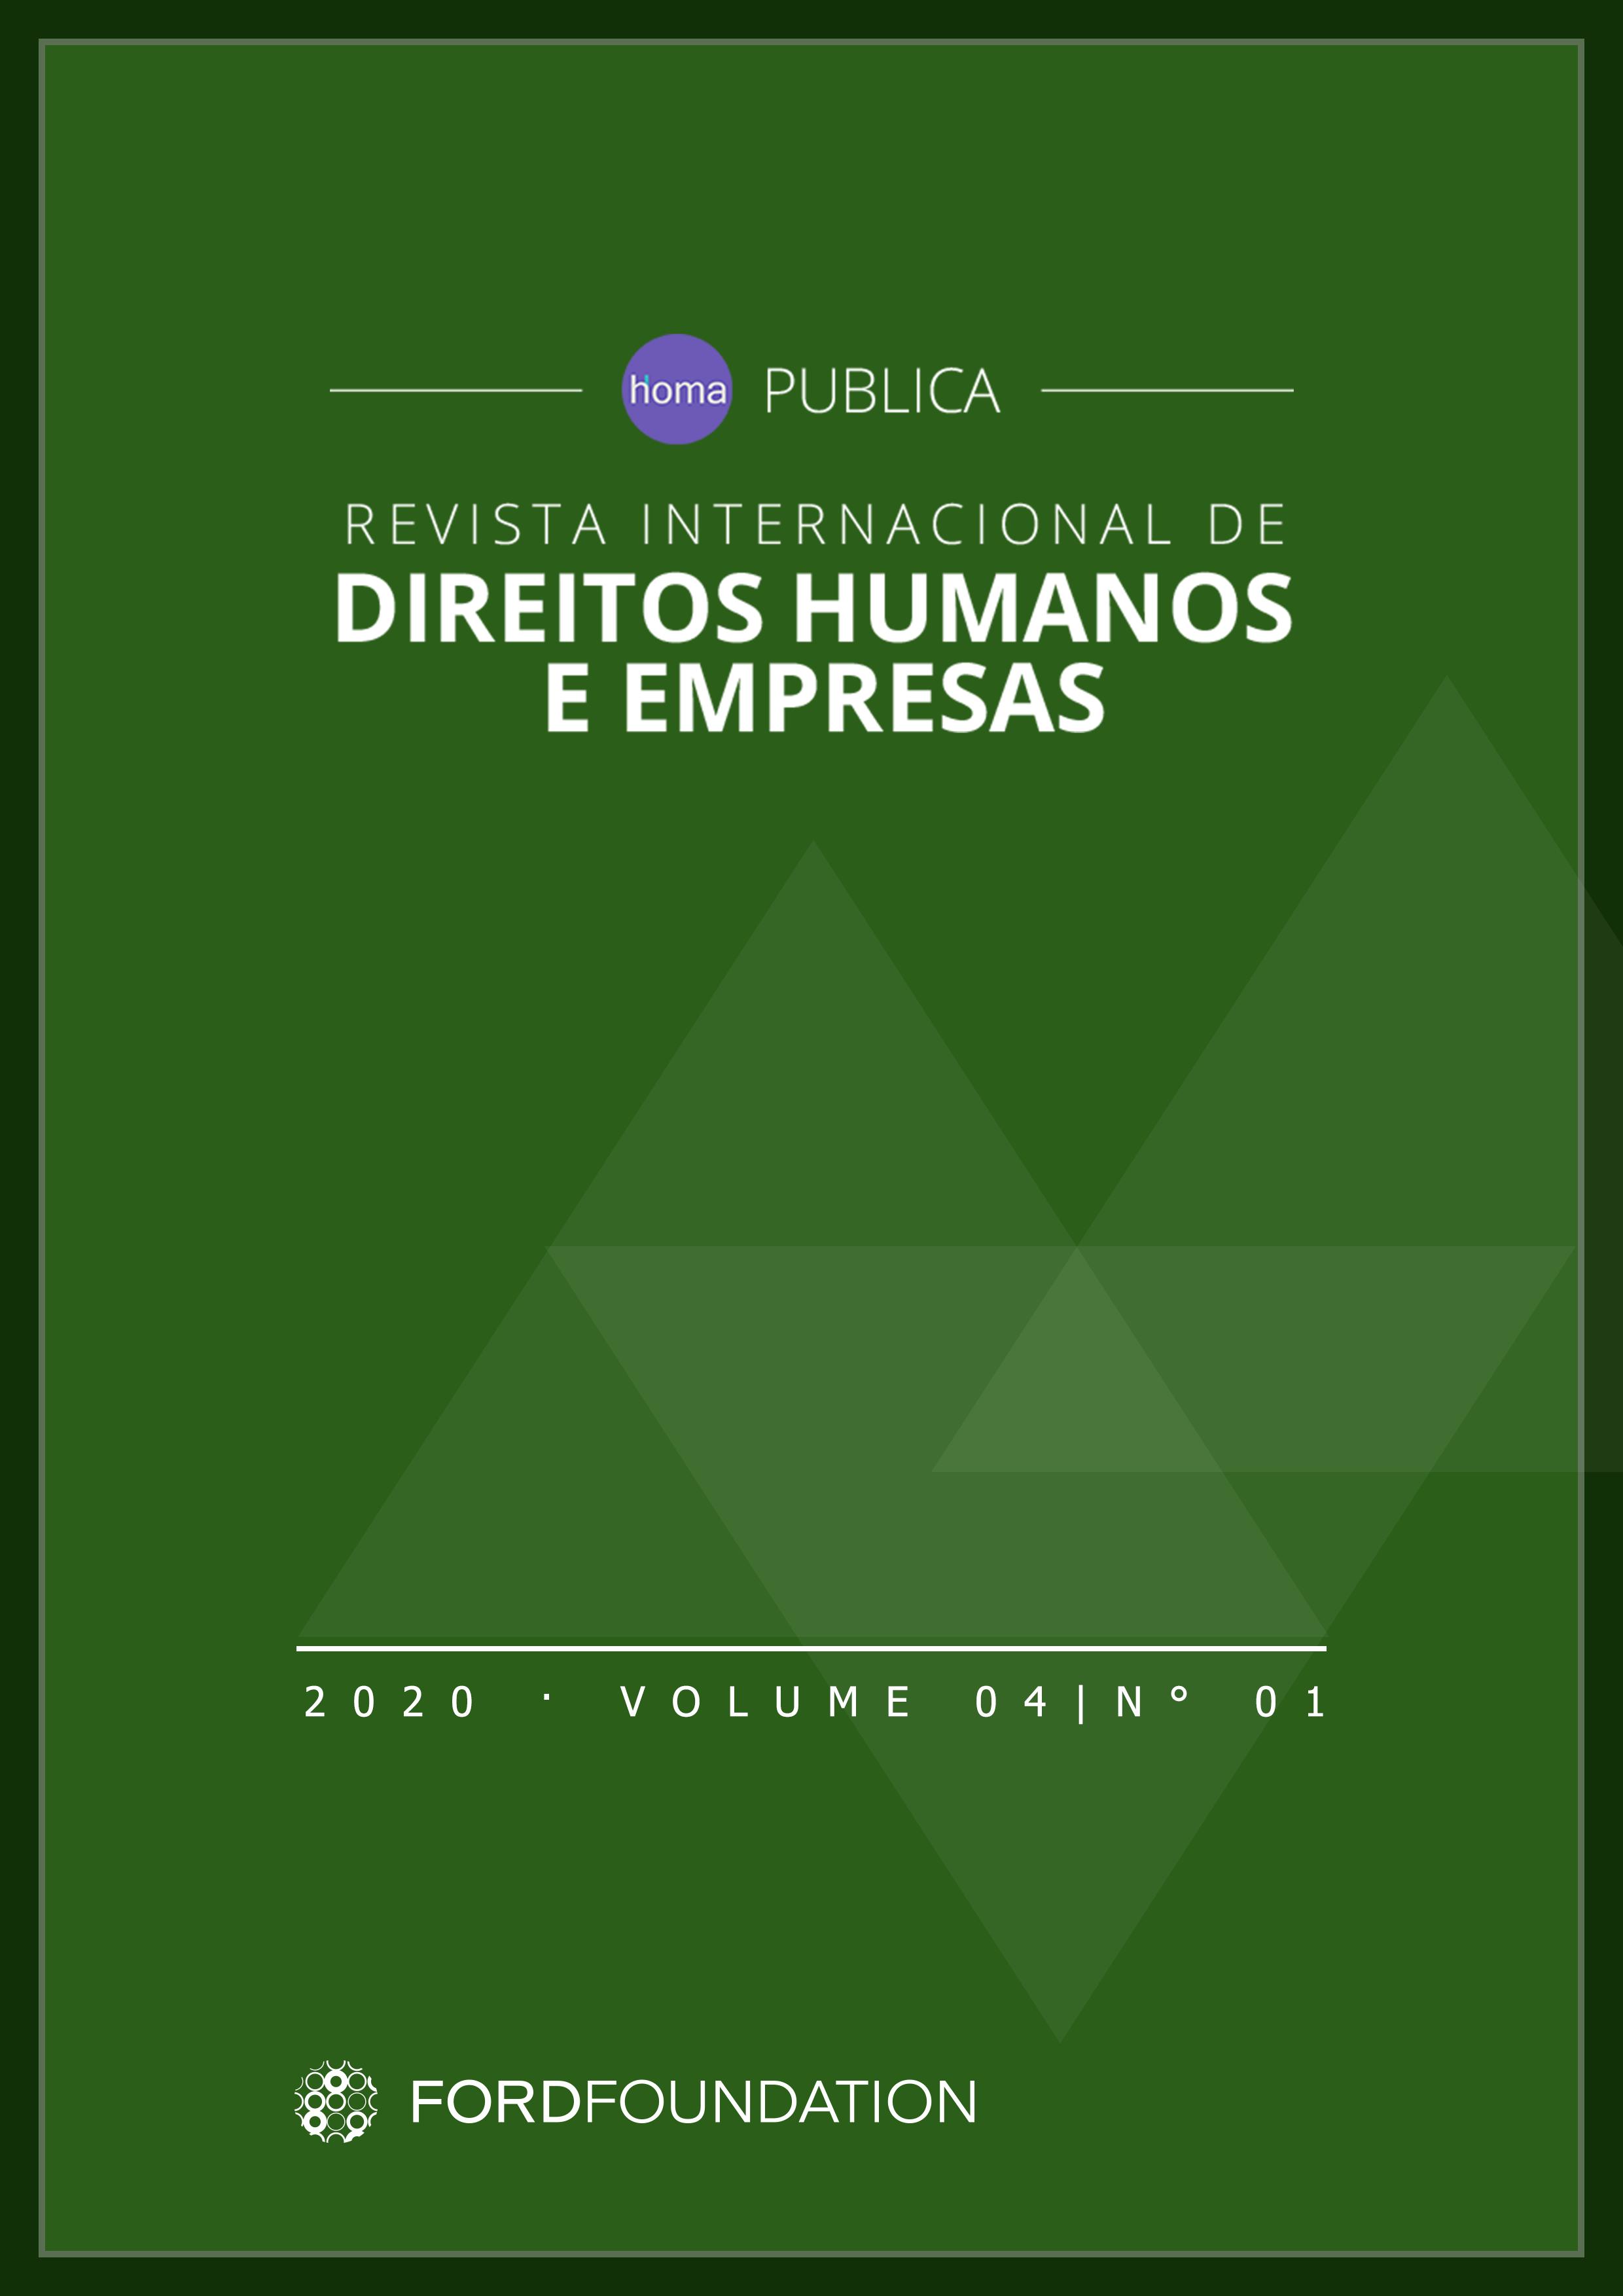 Capa Verde escrito Revista Internacional de Direitos Humanos e Empresas, 2020 Volume 04